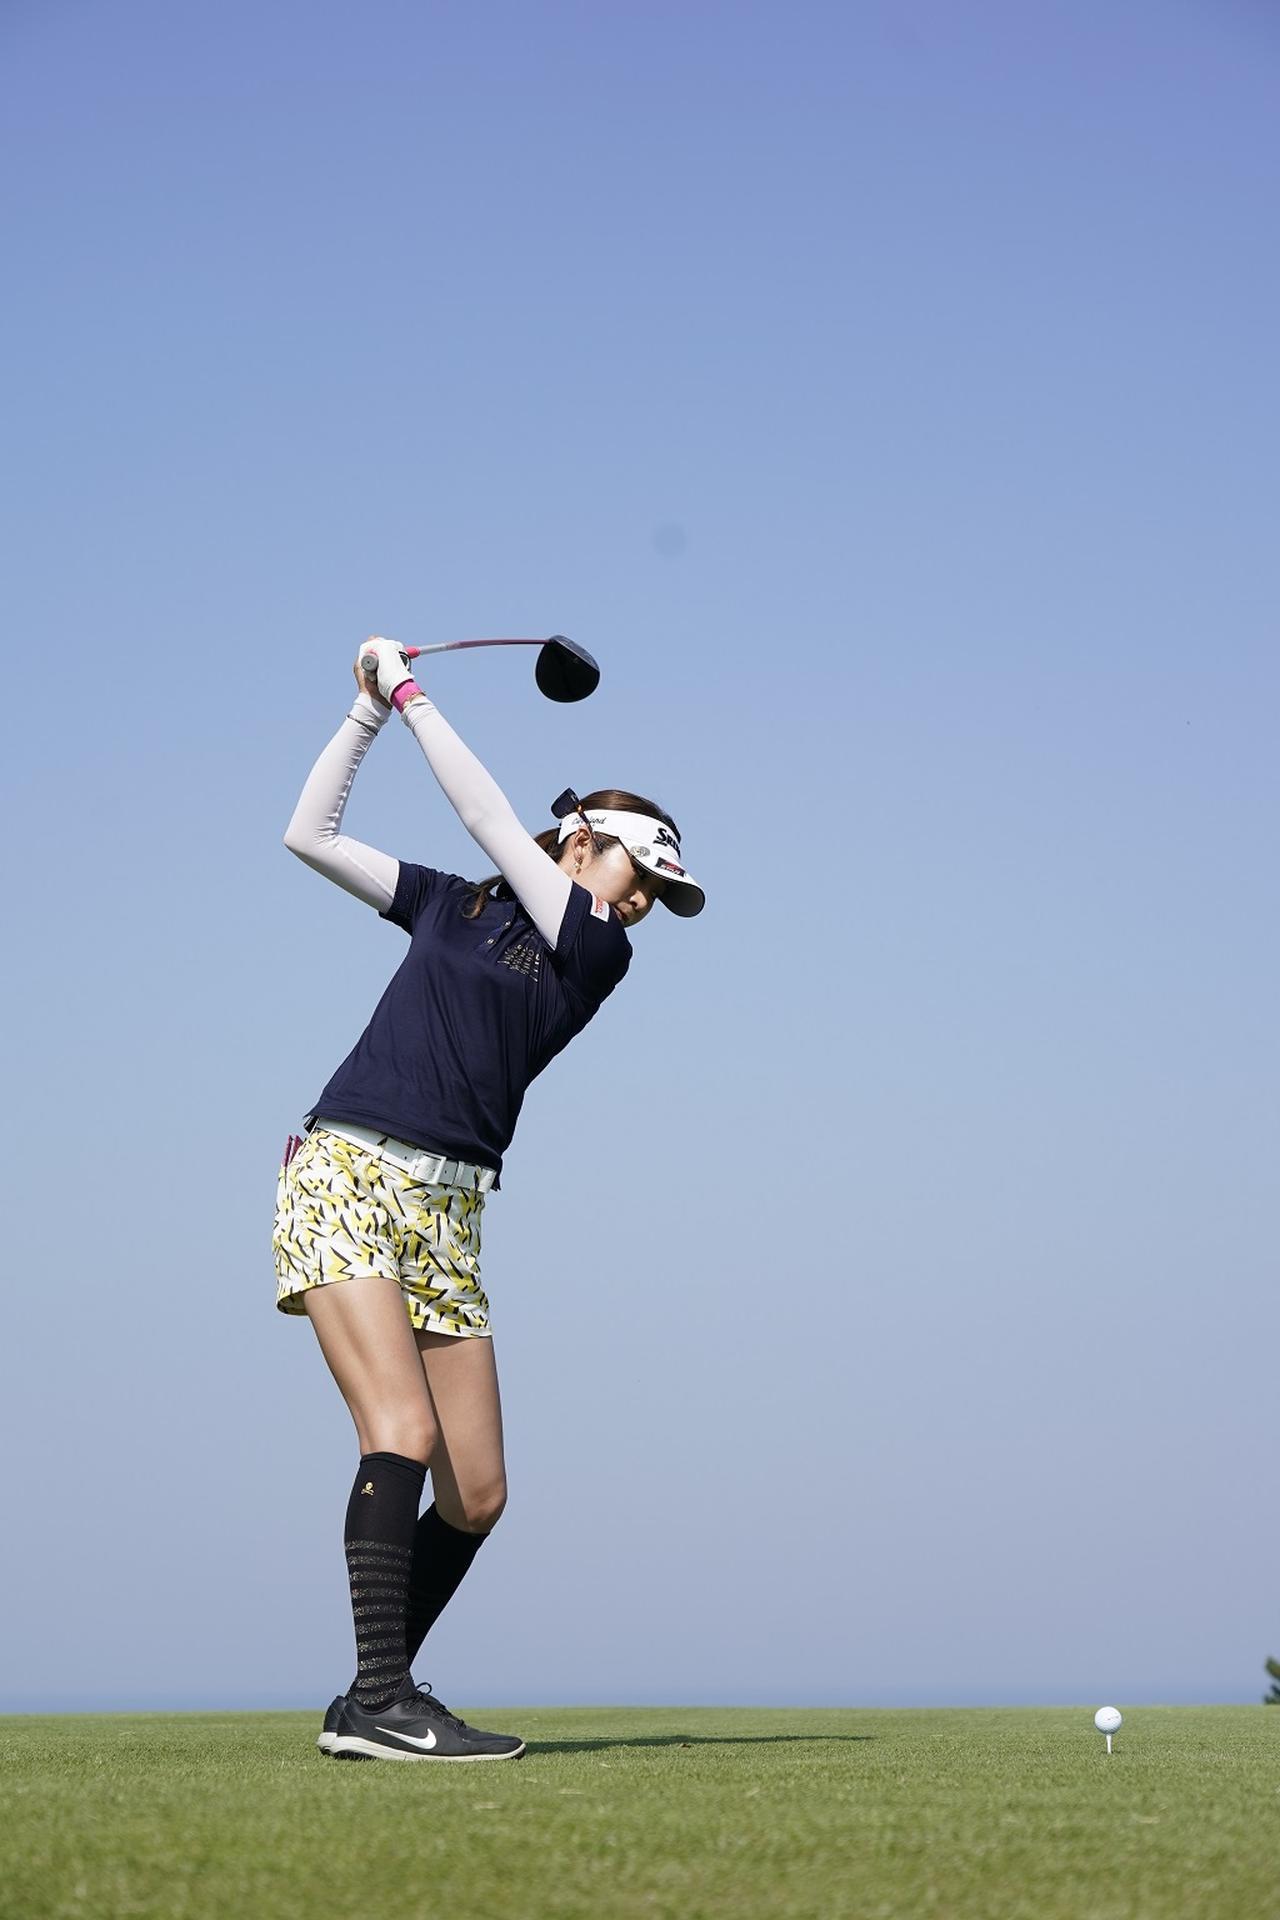 Images : 5番目の画像 - 金田久美子ドライバー後方連続写真 - みんなのゴルフダイジェスト